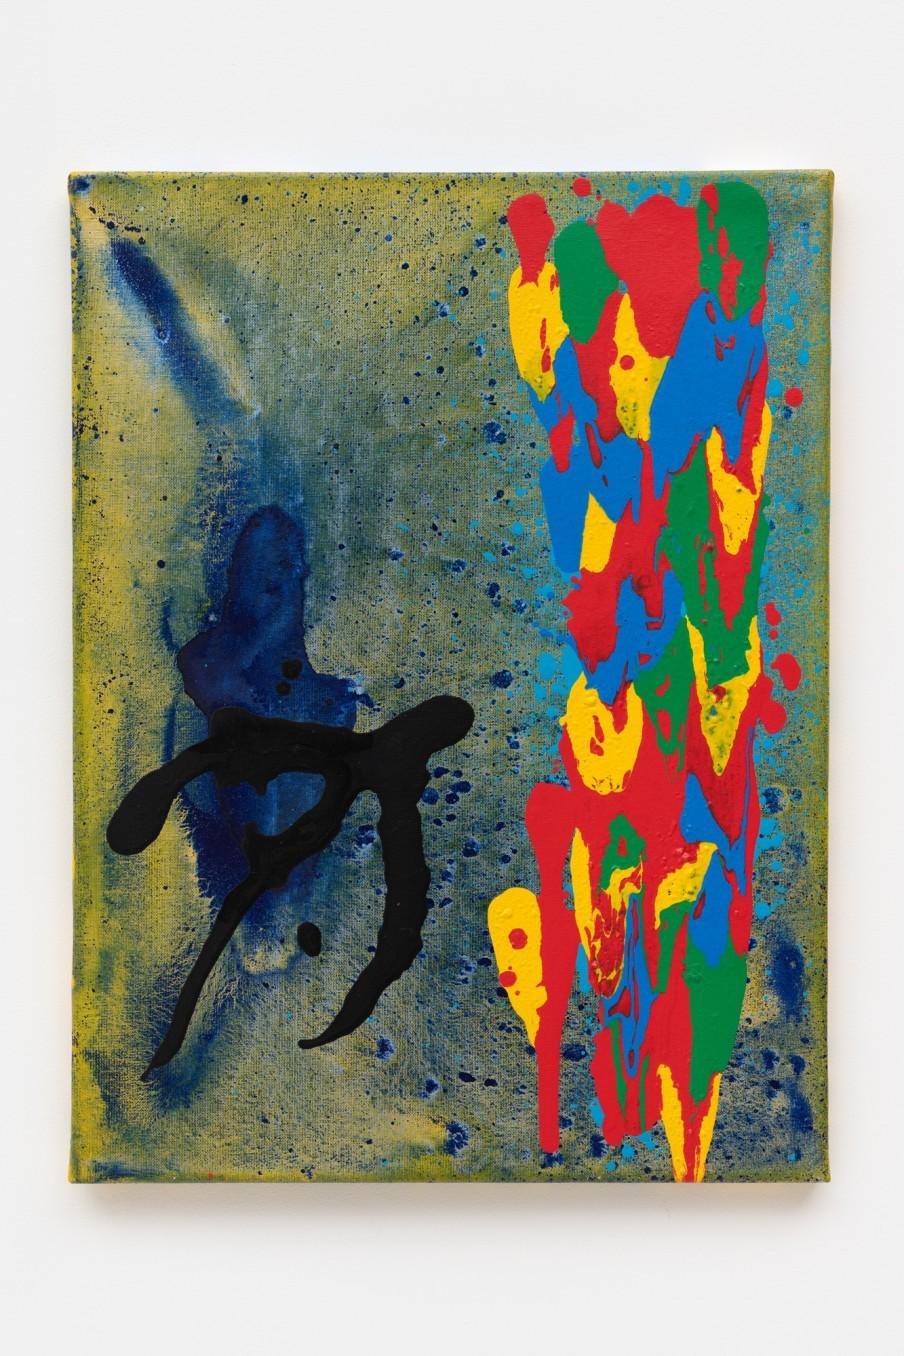 John Hoyland John Crow 6.1.05, 2005 Acrylic on canvas 61 x 45.7 cm 24 x 18 in